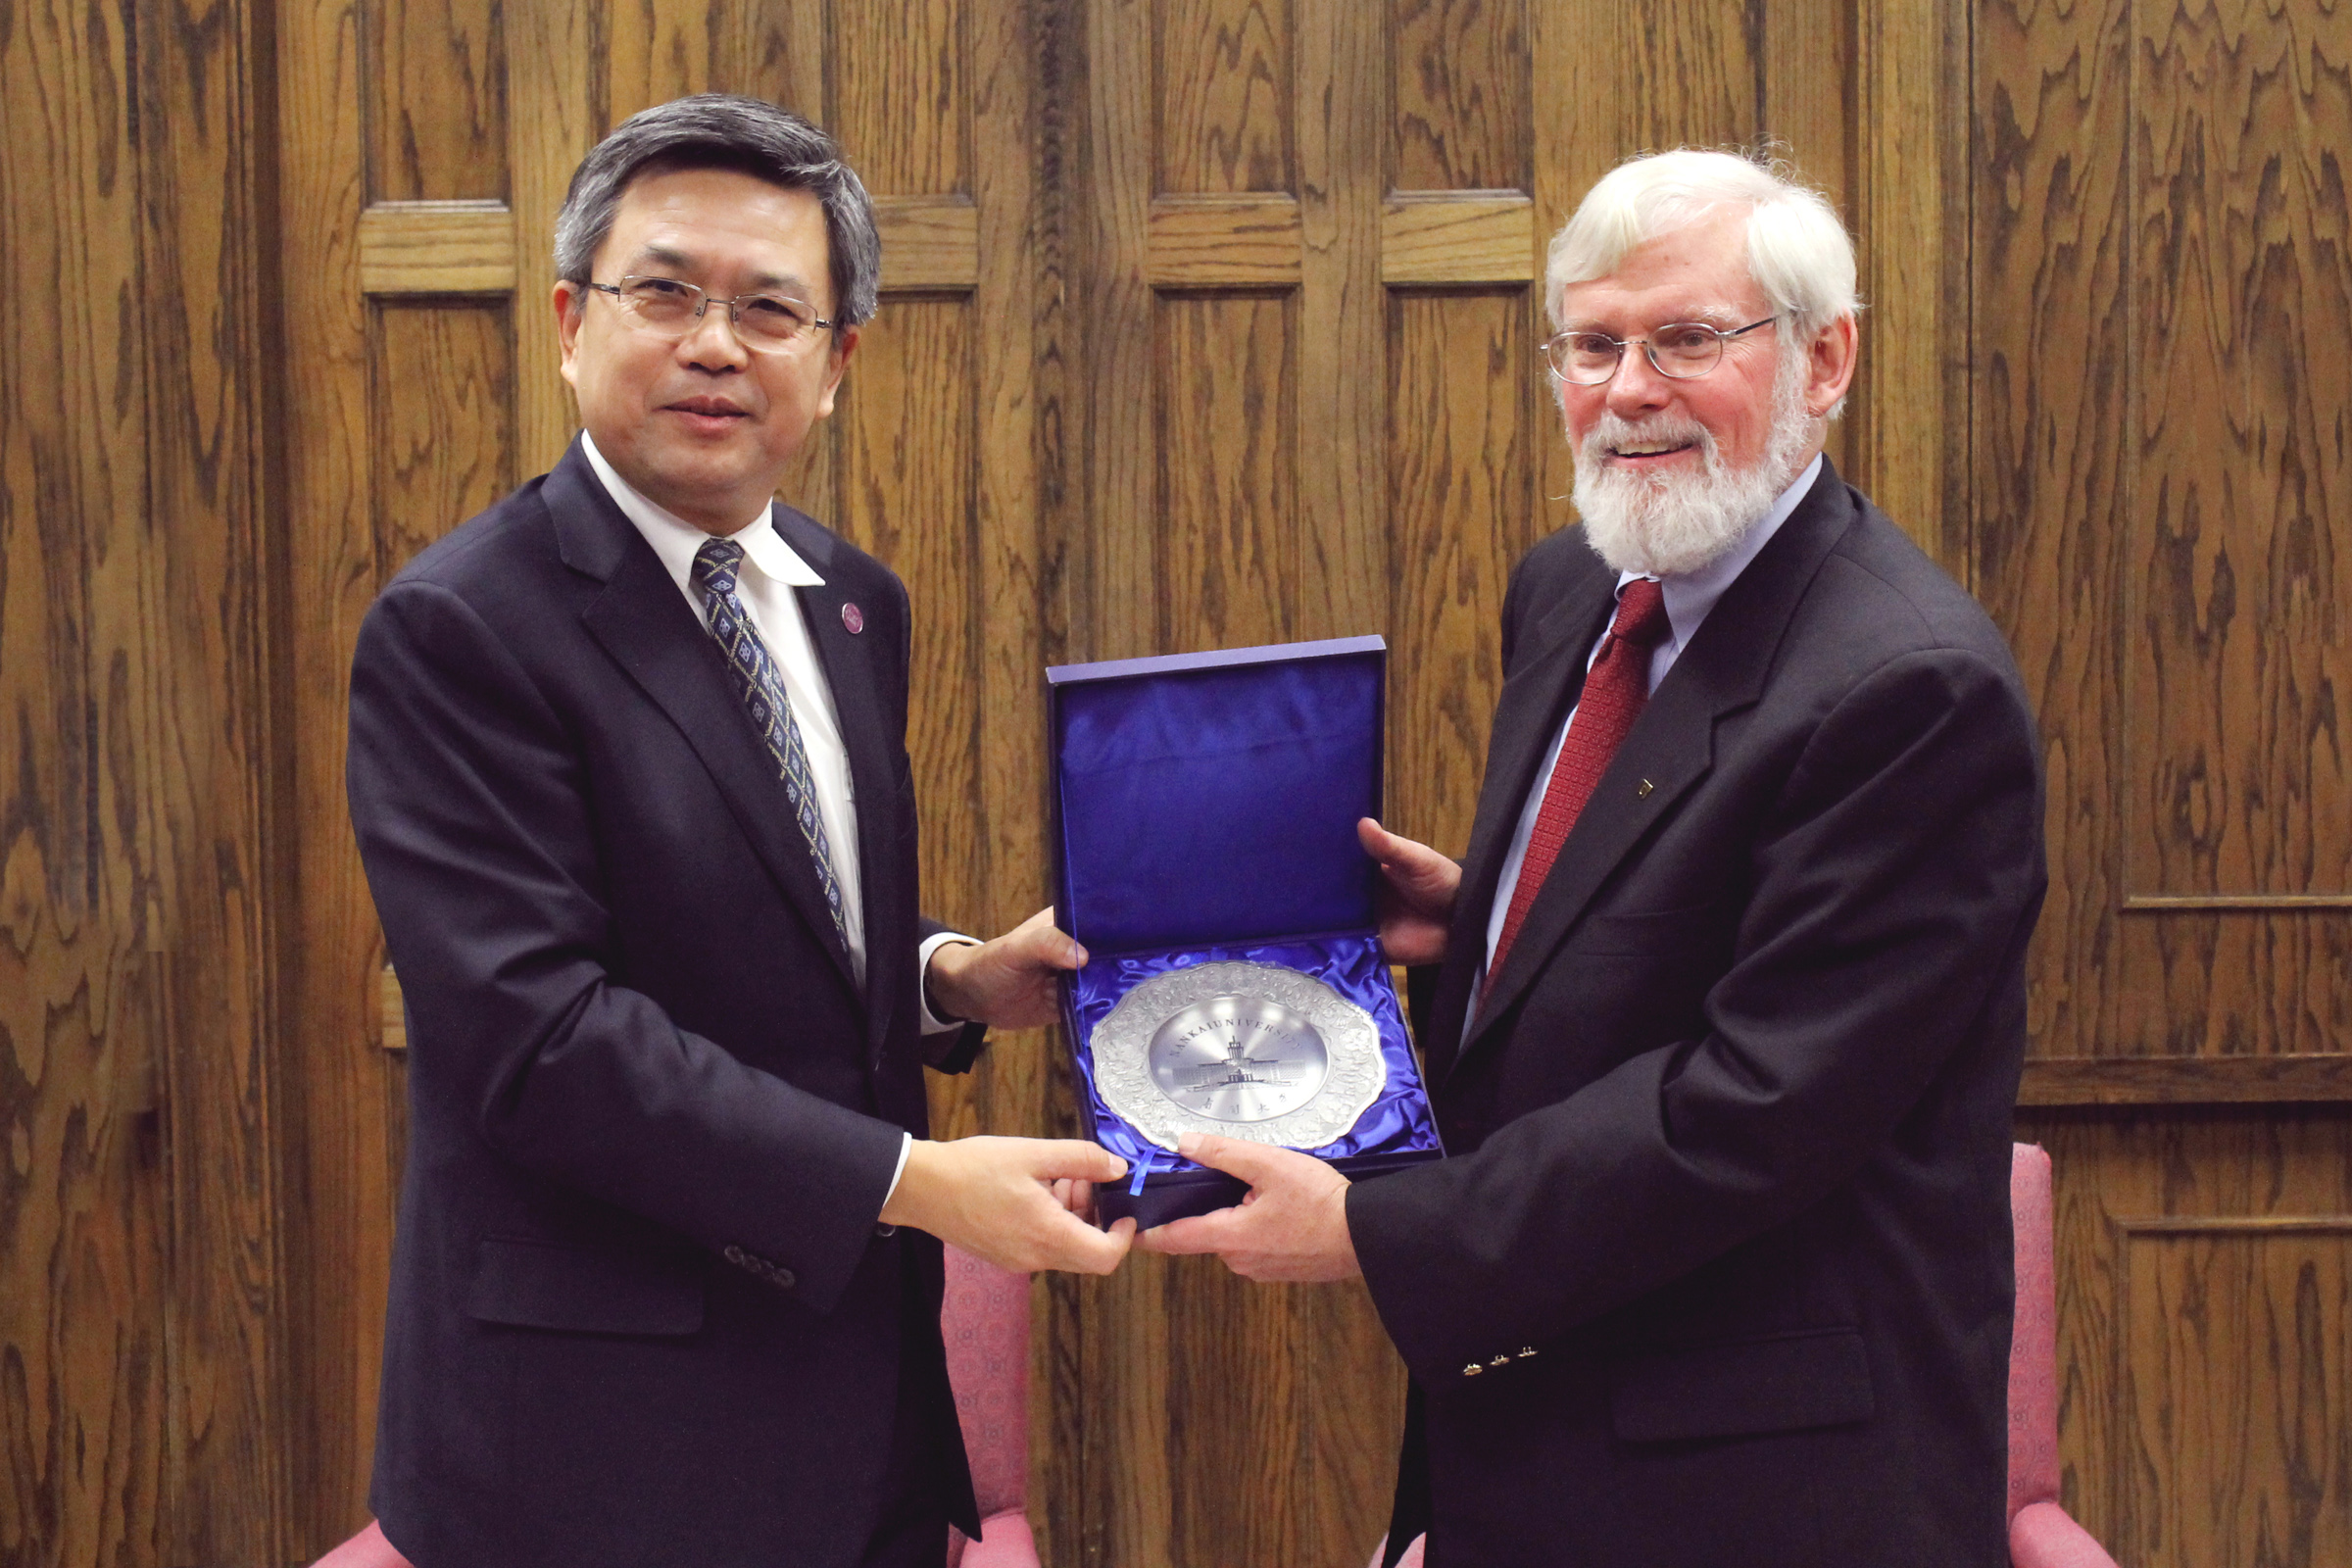 Ke presenting Pershing with commemorative plate from Nankai University at signing ceremony, Thursday Nov. 19, 2013.